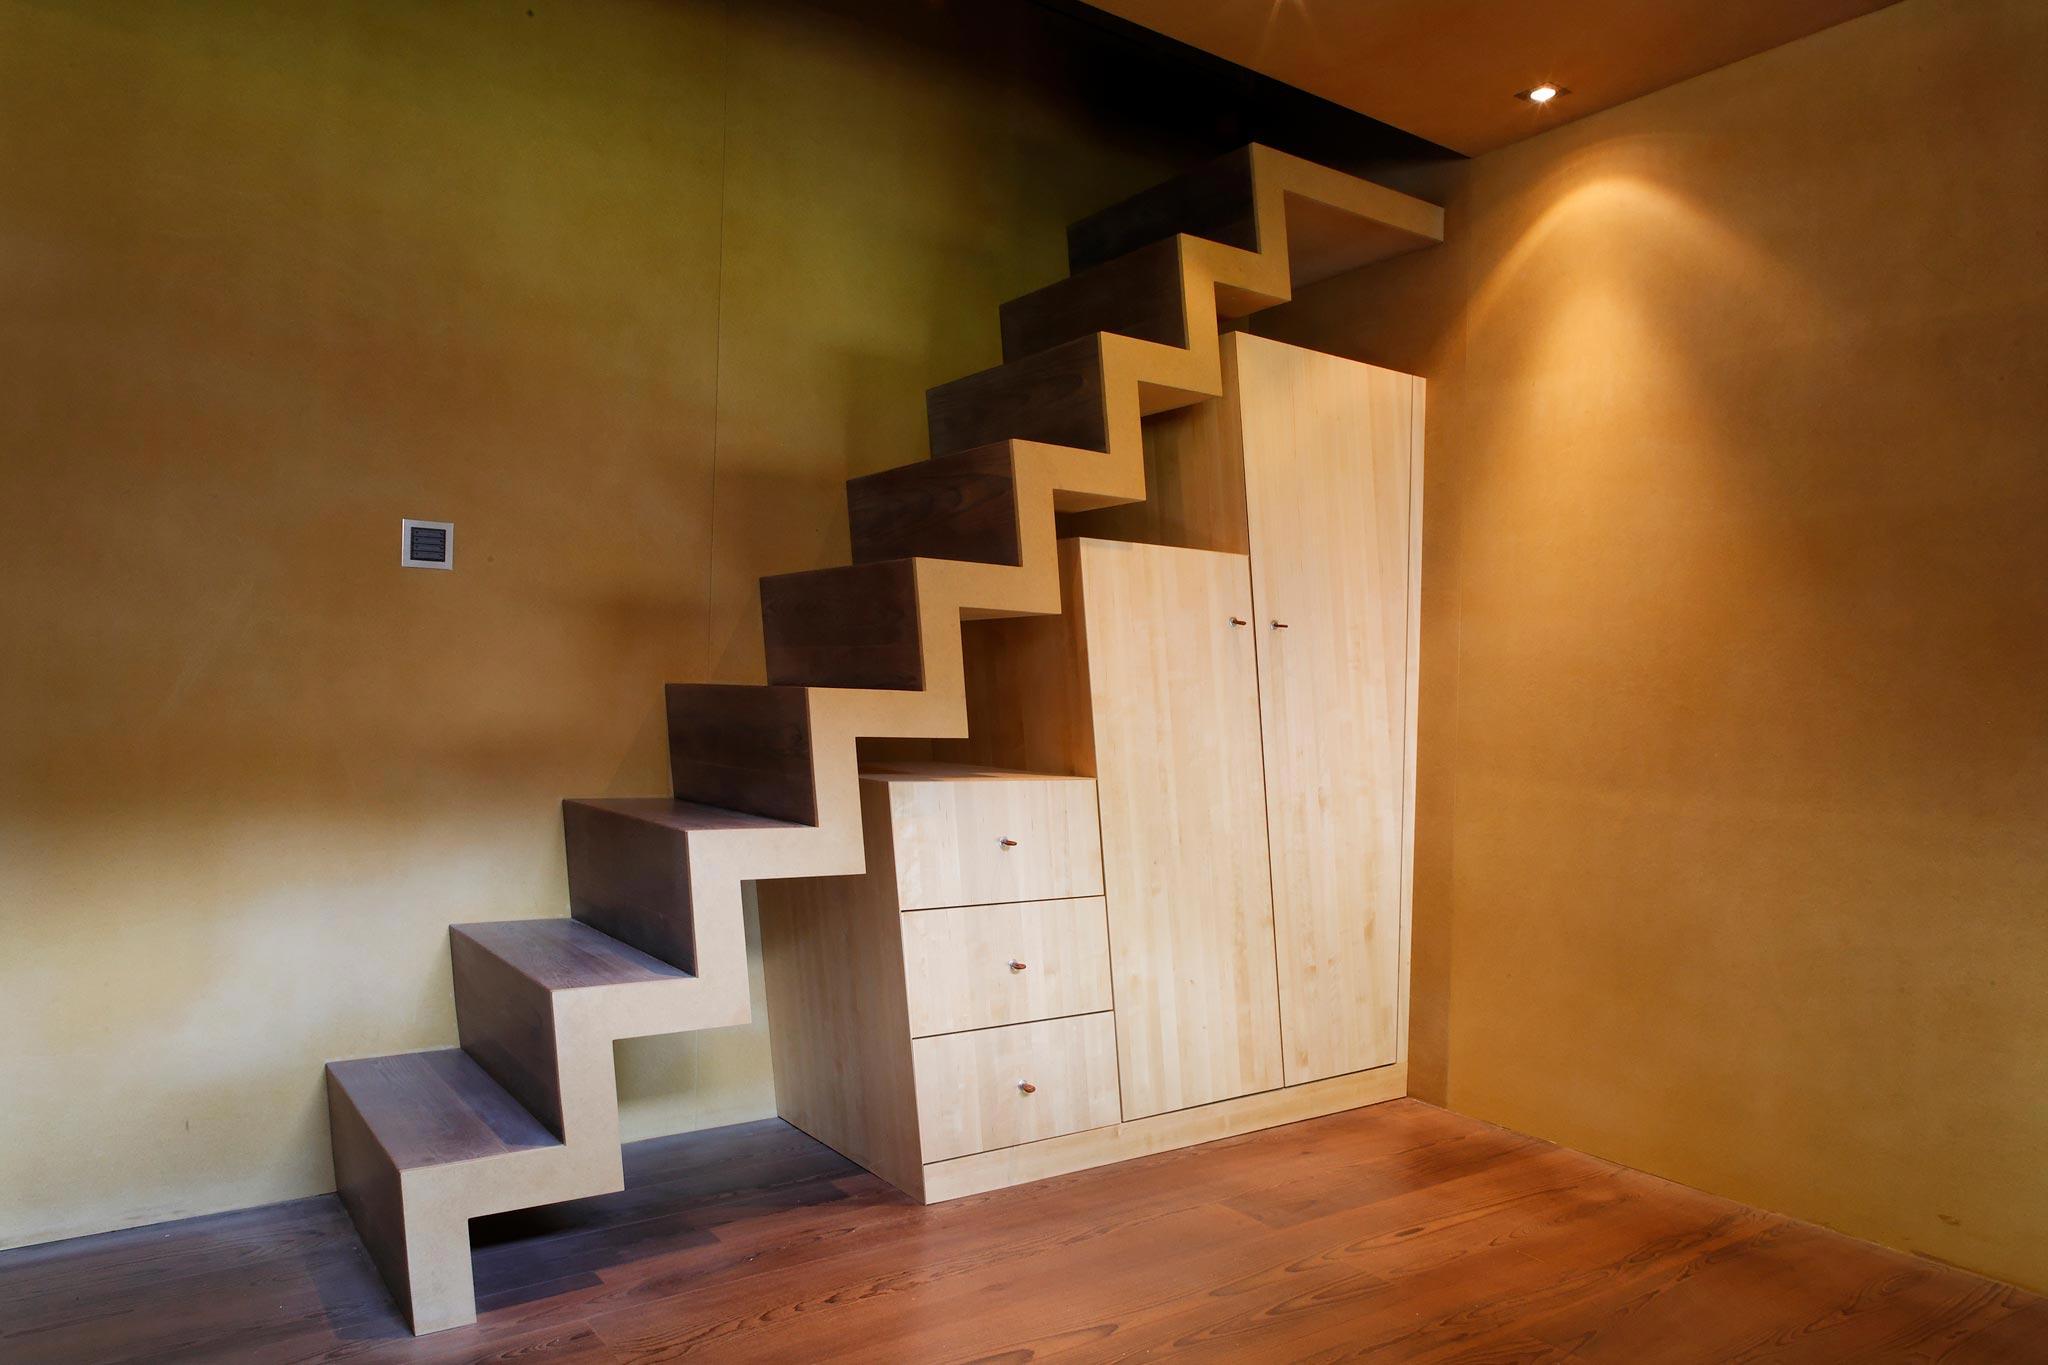 Es Gd Raccard 678 escalierEtage hor 20 05 010 - Le 2ème escalier du Grand Raccard